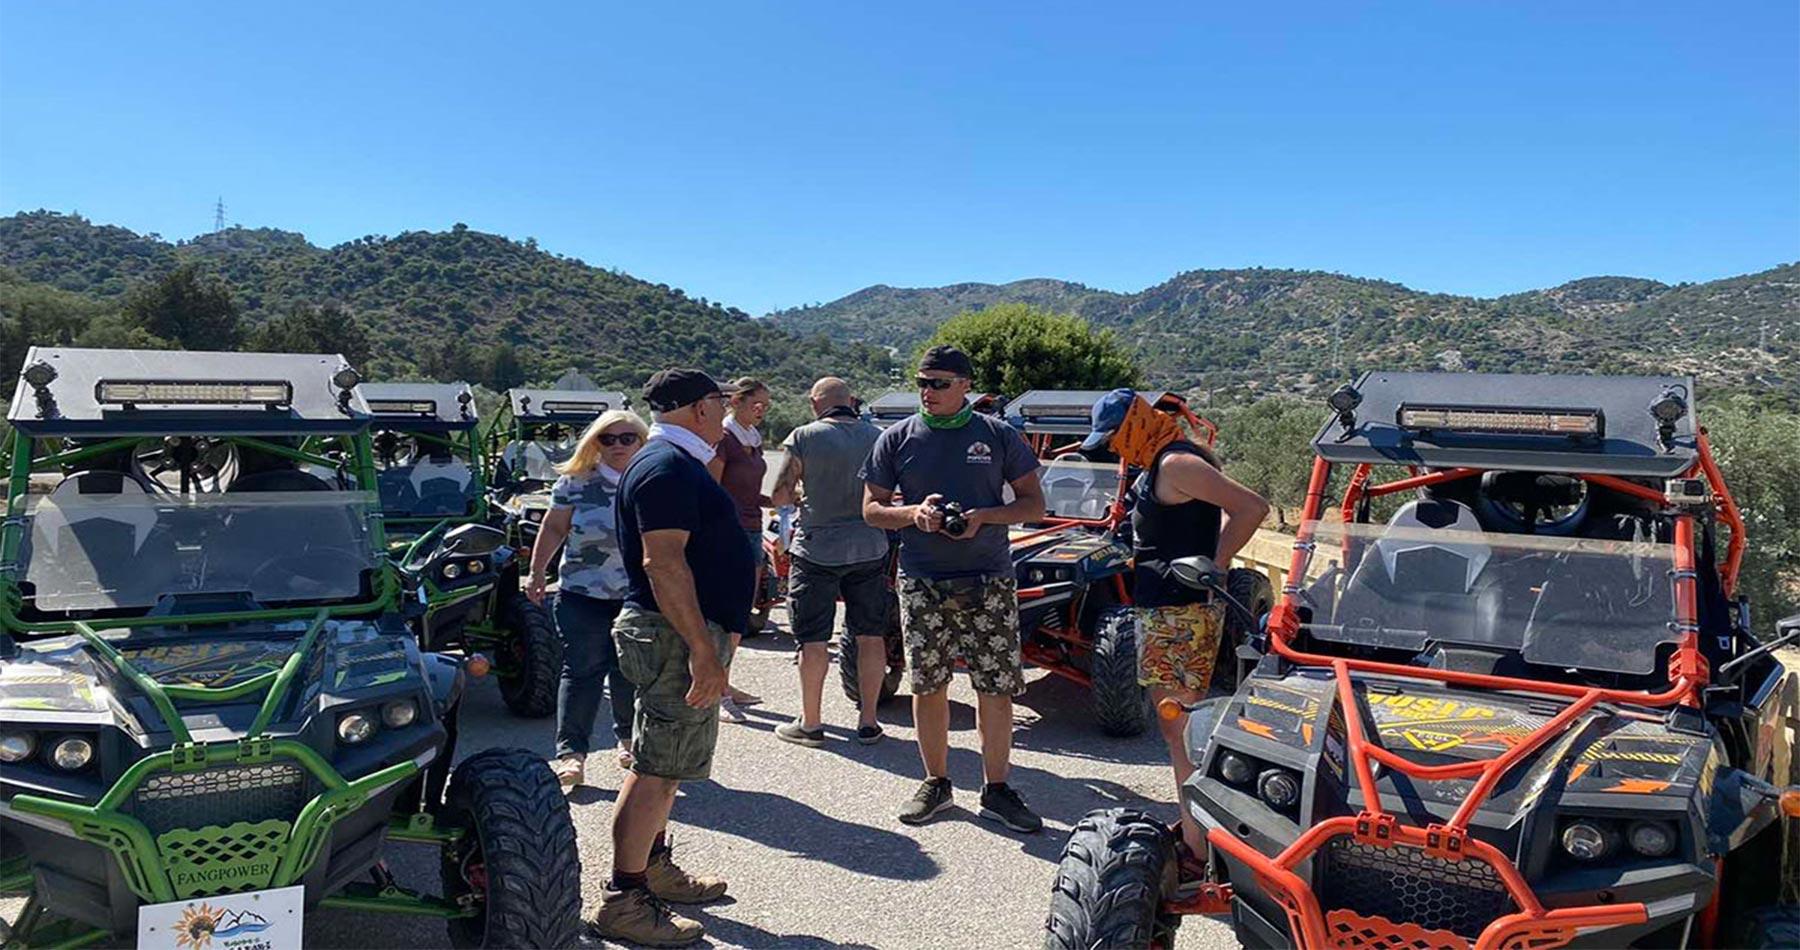 rhodes experience buggy safari 24-1